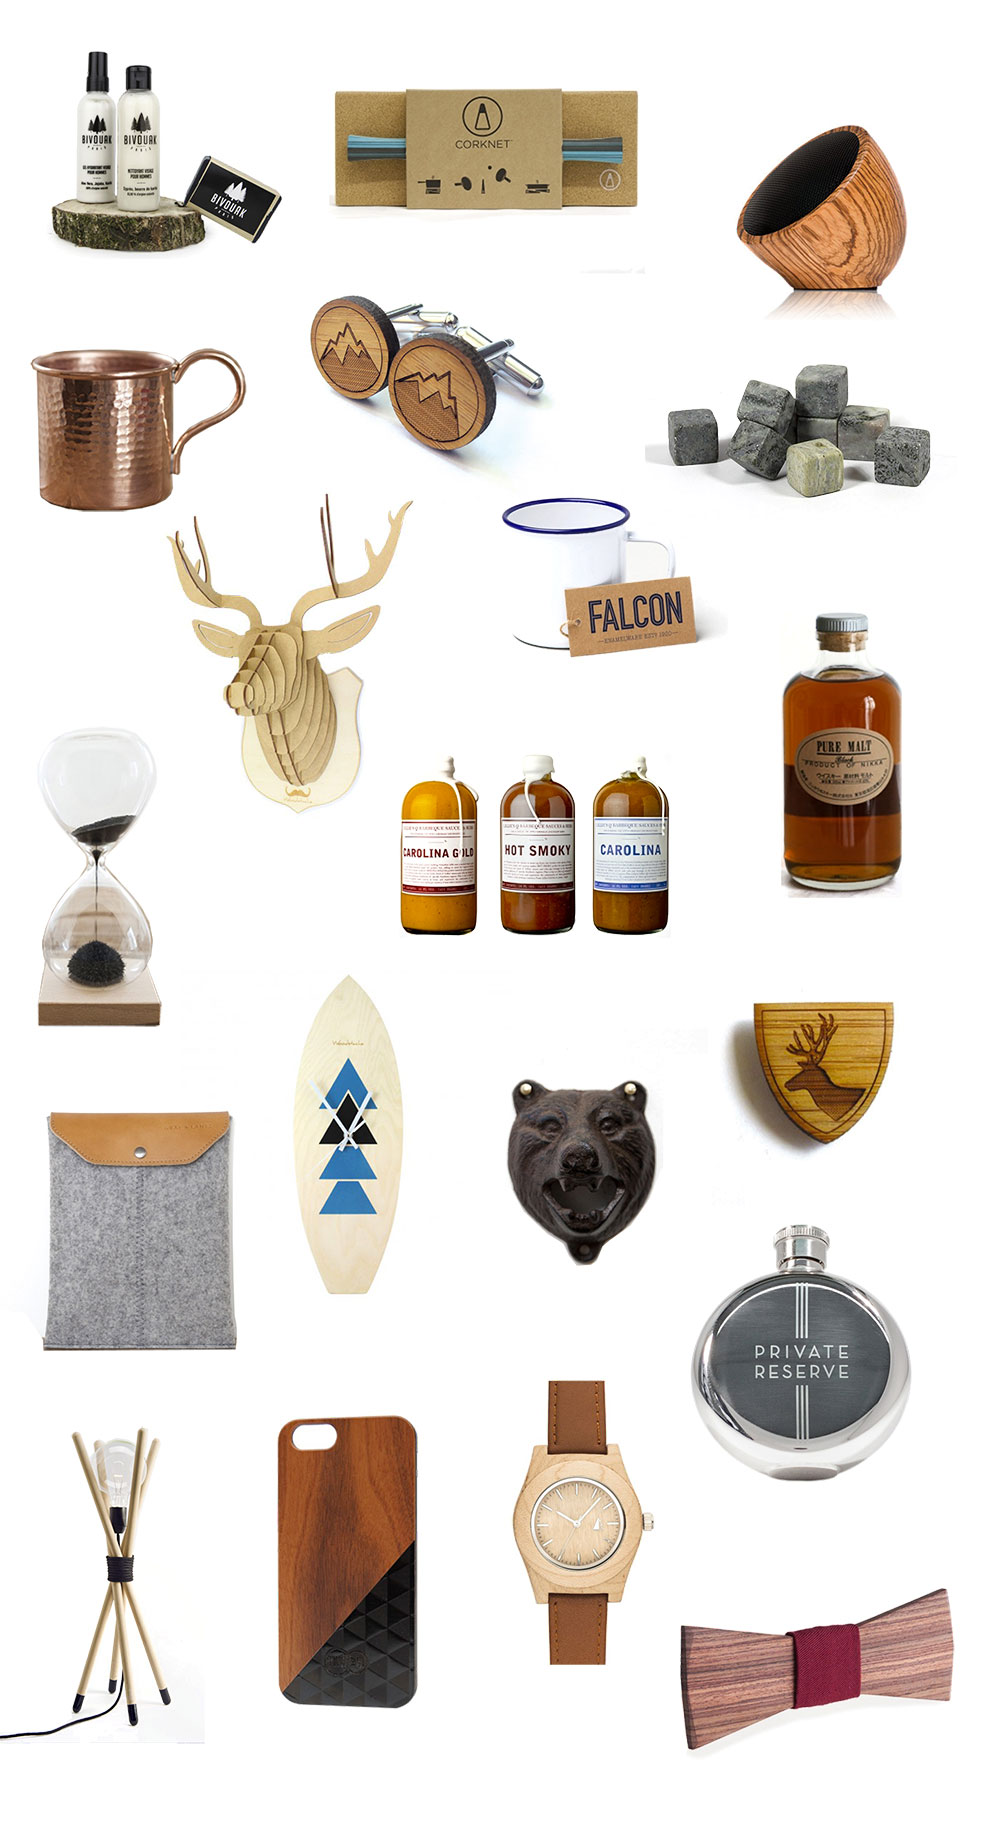 Idees-cadeaux-originales-noel-homme